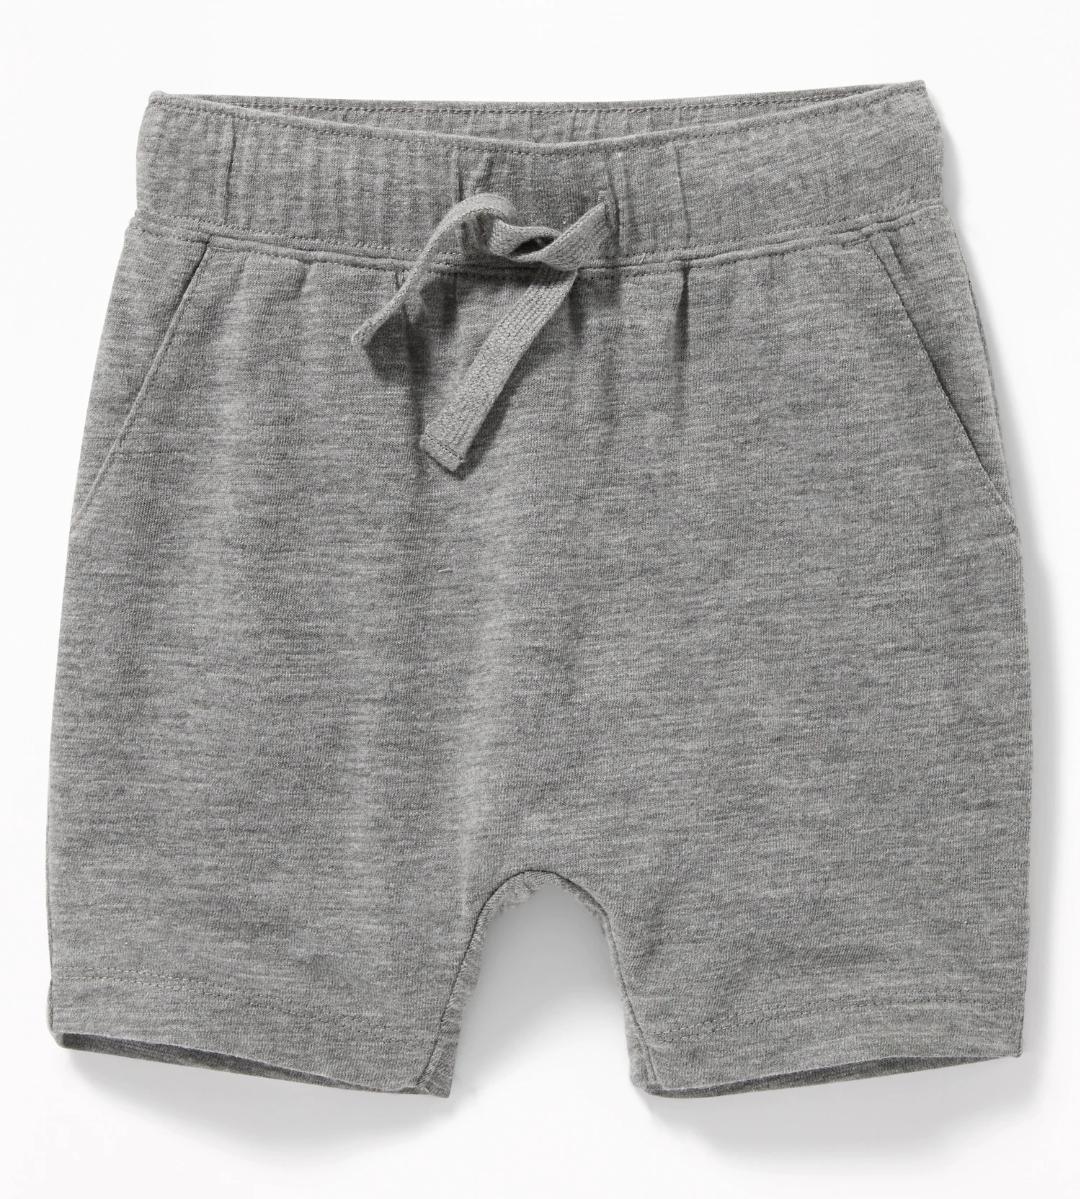 U-Shaped Shorts in Dark Heather Gray